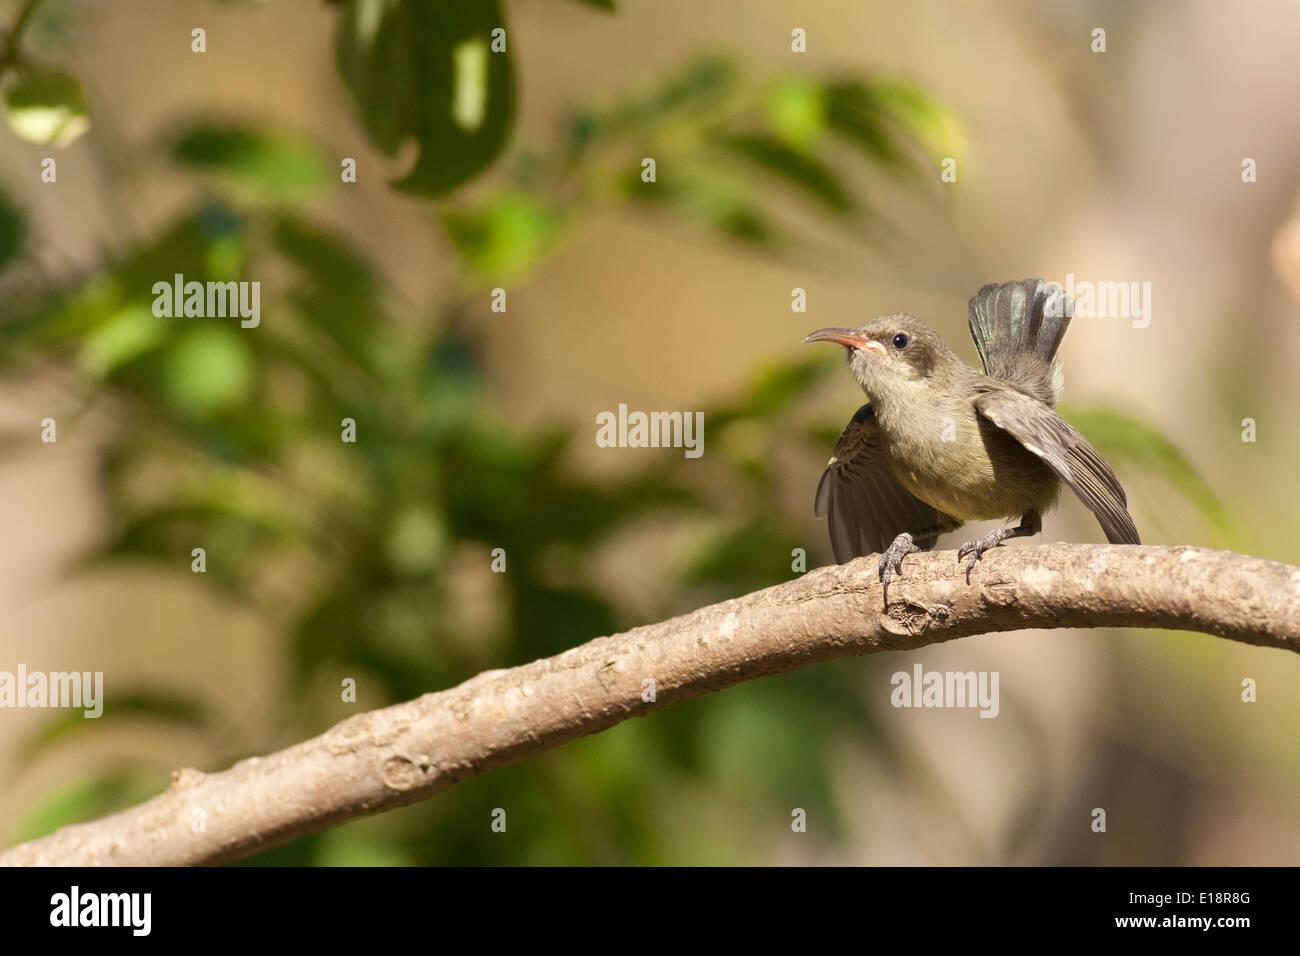 young Palestine Sunbird or Northern Orange-tufted Sunbird hatchling (Cinnyris oseus) - Stock Image